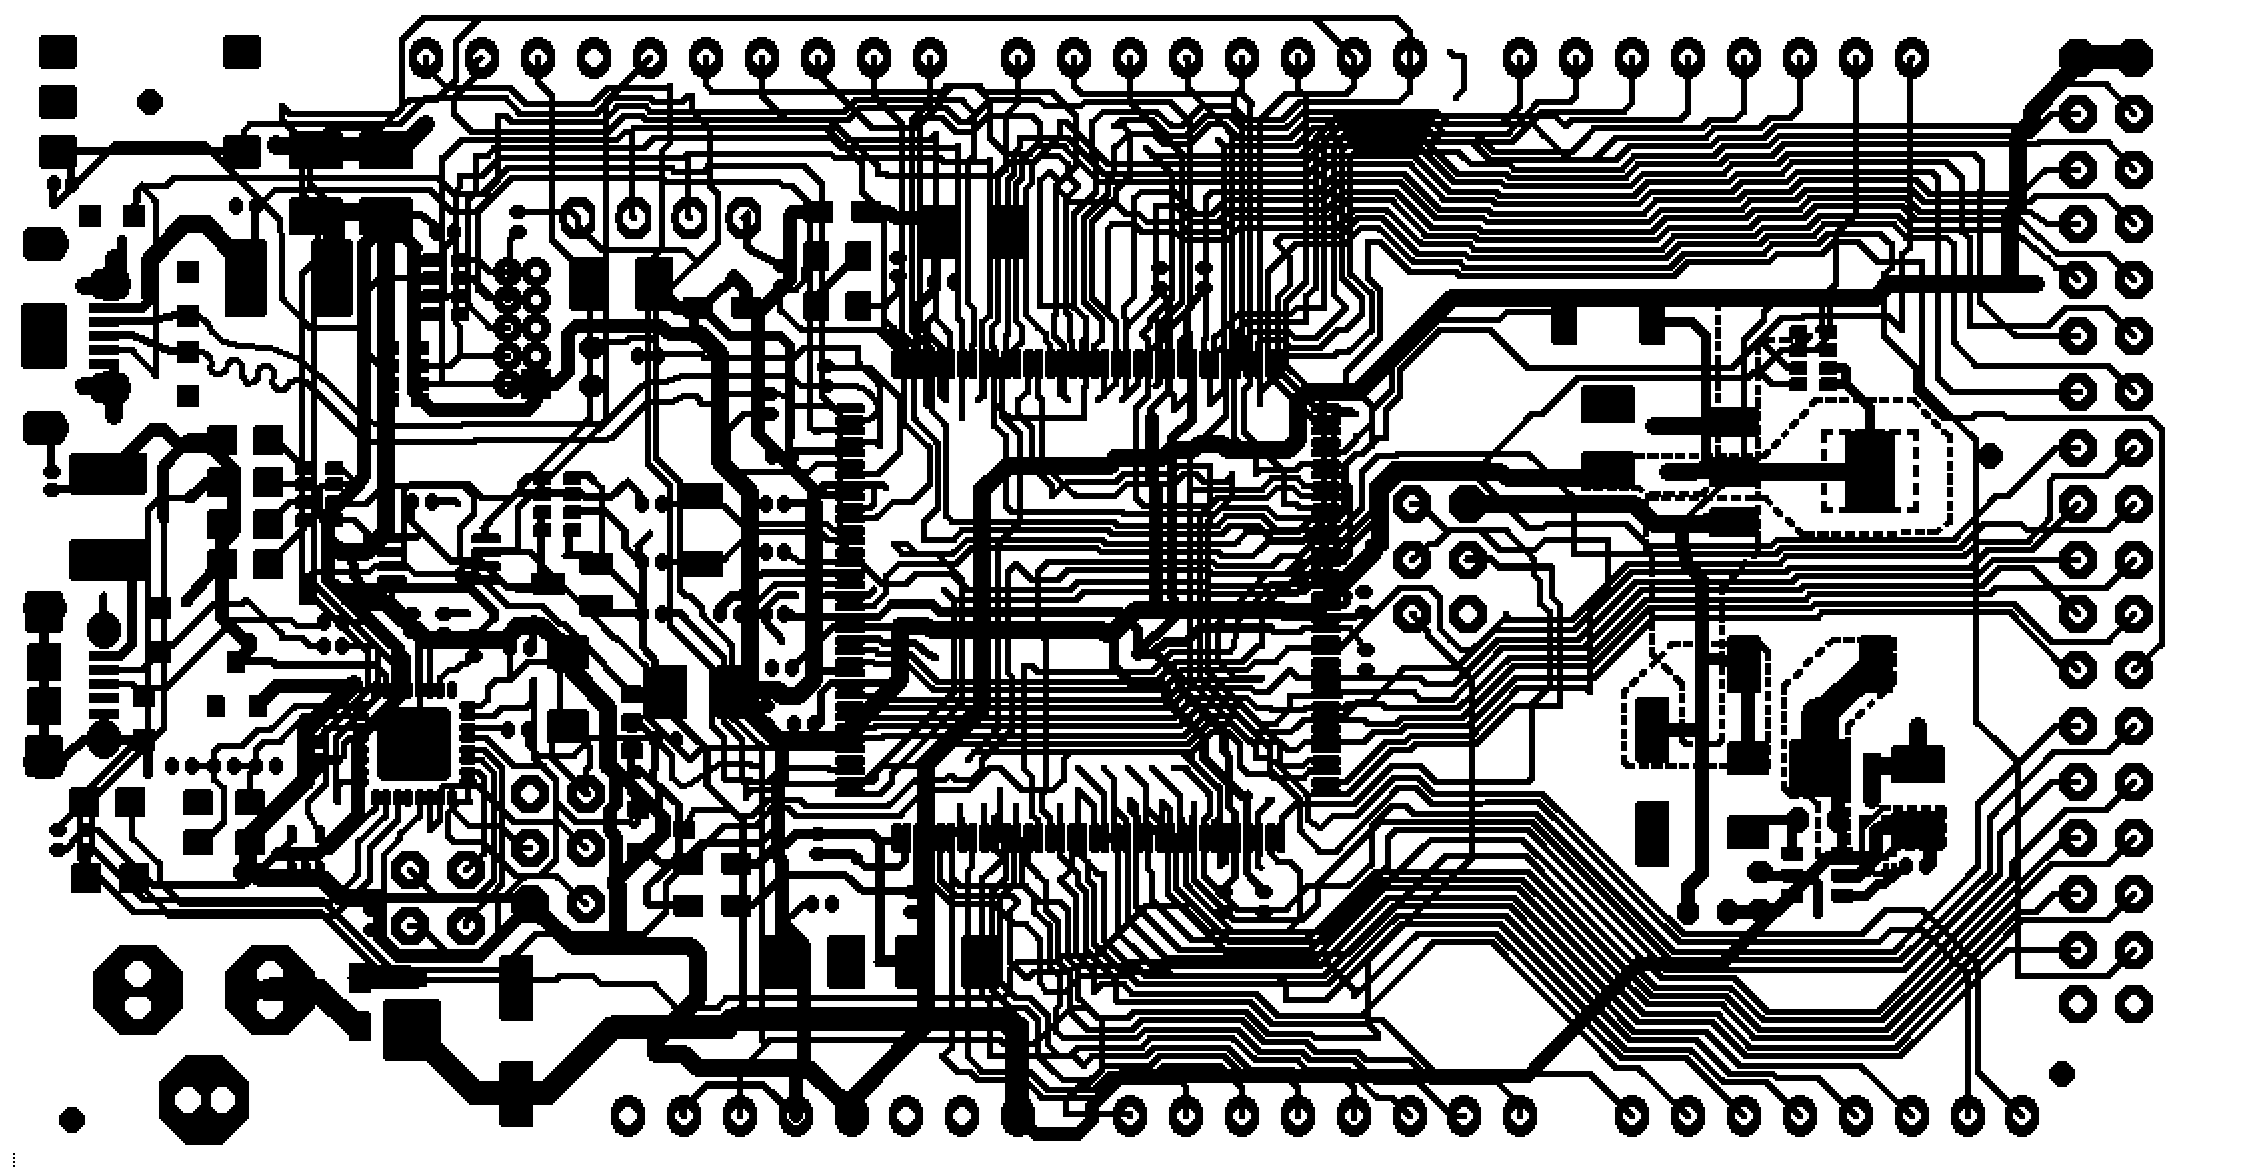 Electric Circuit Tattoo Diagram Tattoos Vias Wiring Services